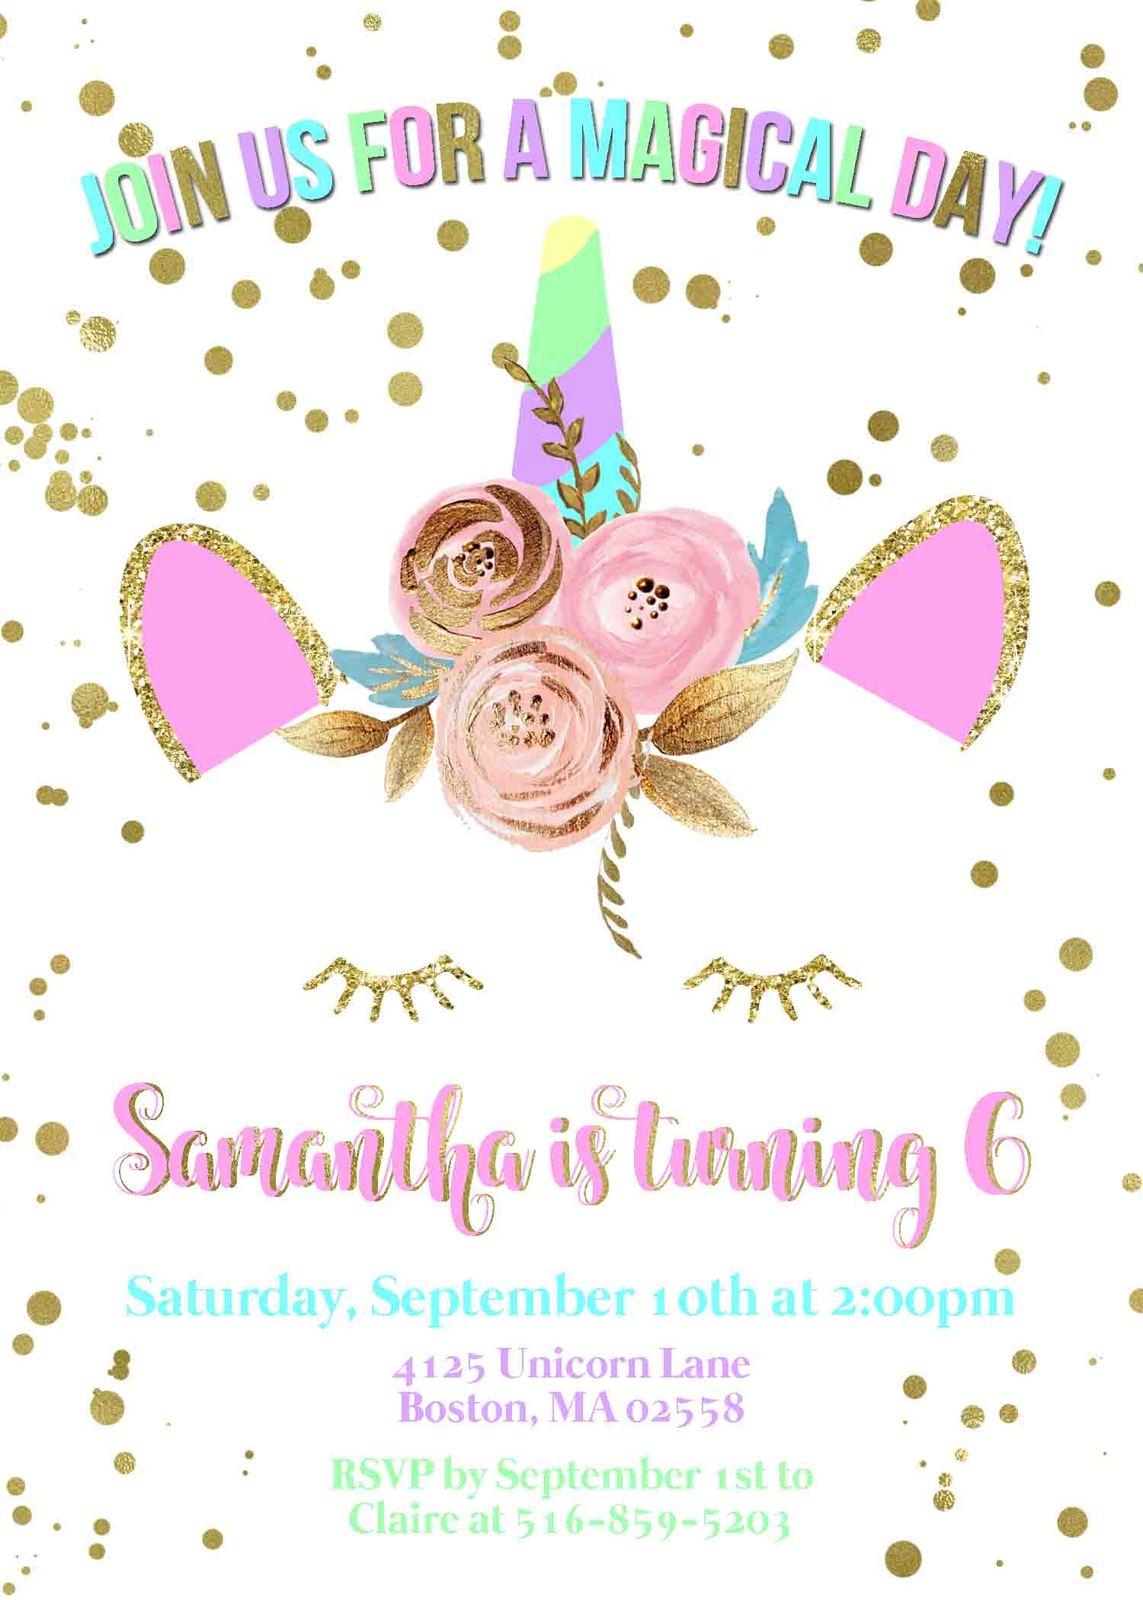 Whimsical Unicorn Invitation Pink Gold and 47 similar items